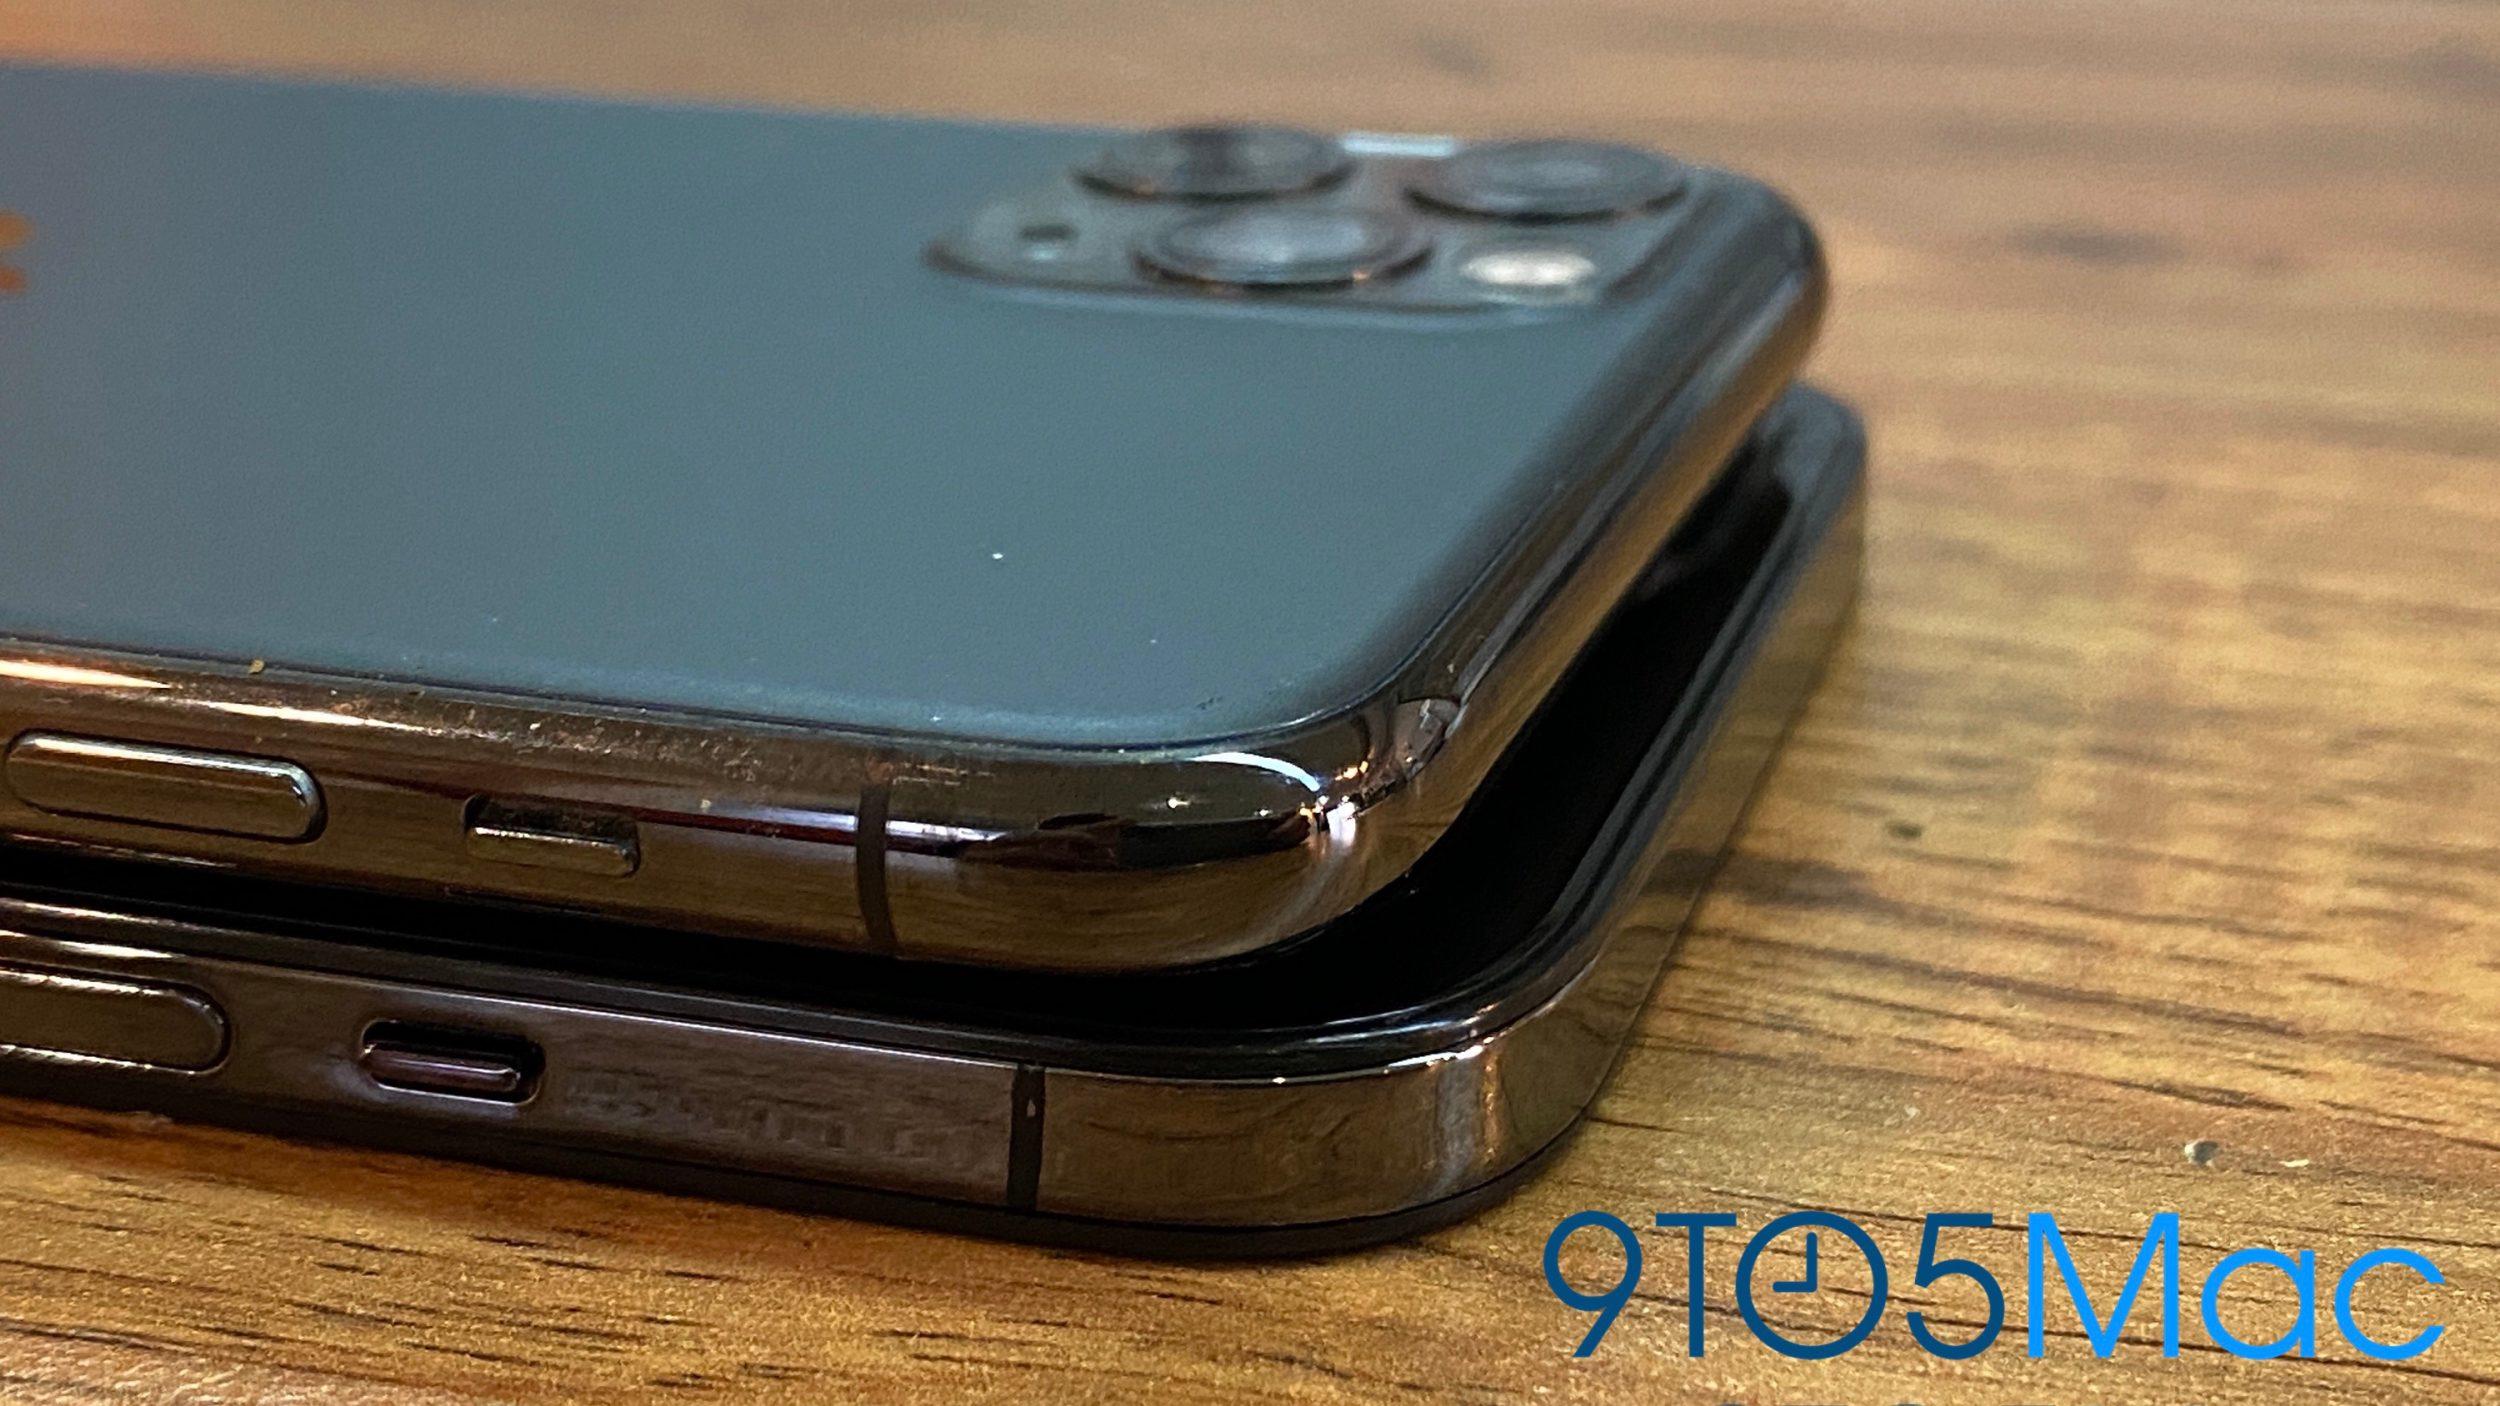 iPhone-12-0006-1.jpg?w=2500&quality=82&strip=all&ssl=1